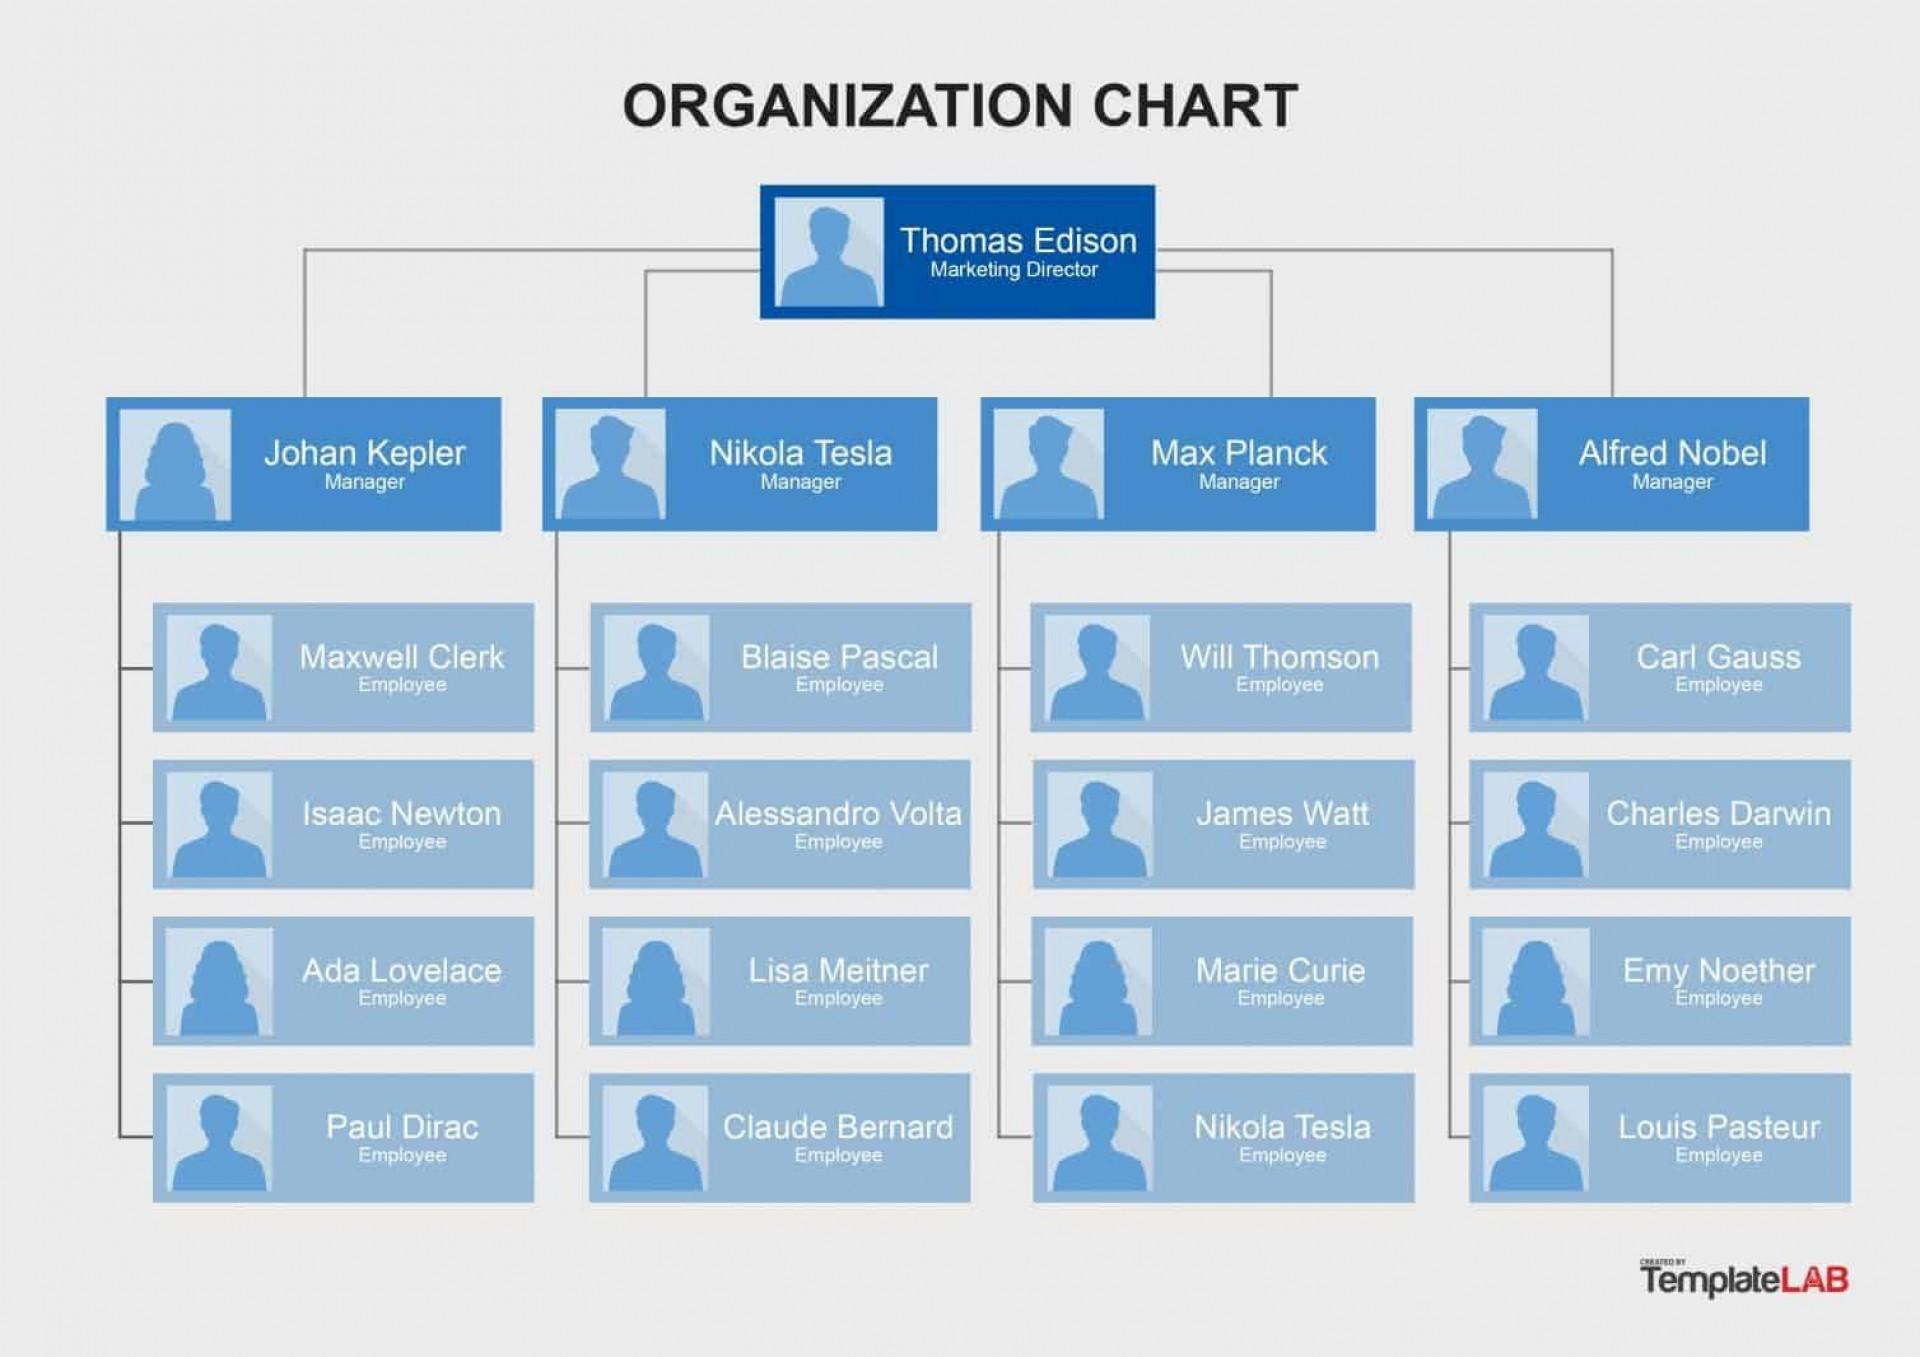 002 Beautiful Org Chart Template Microsoft Word 2010 Image 1920